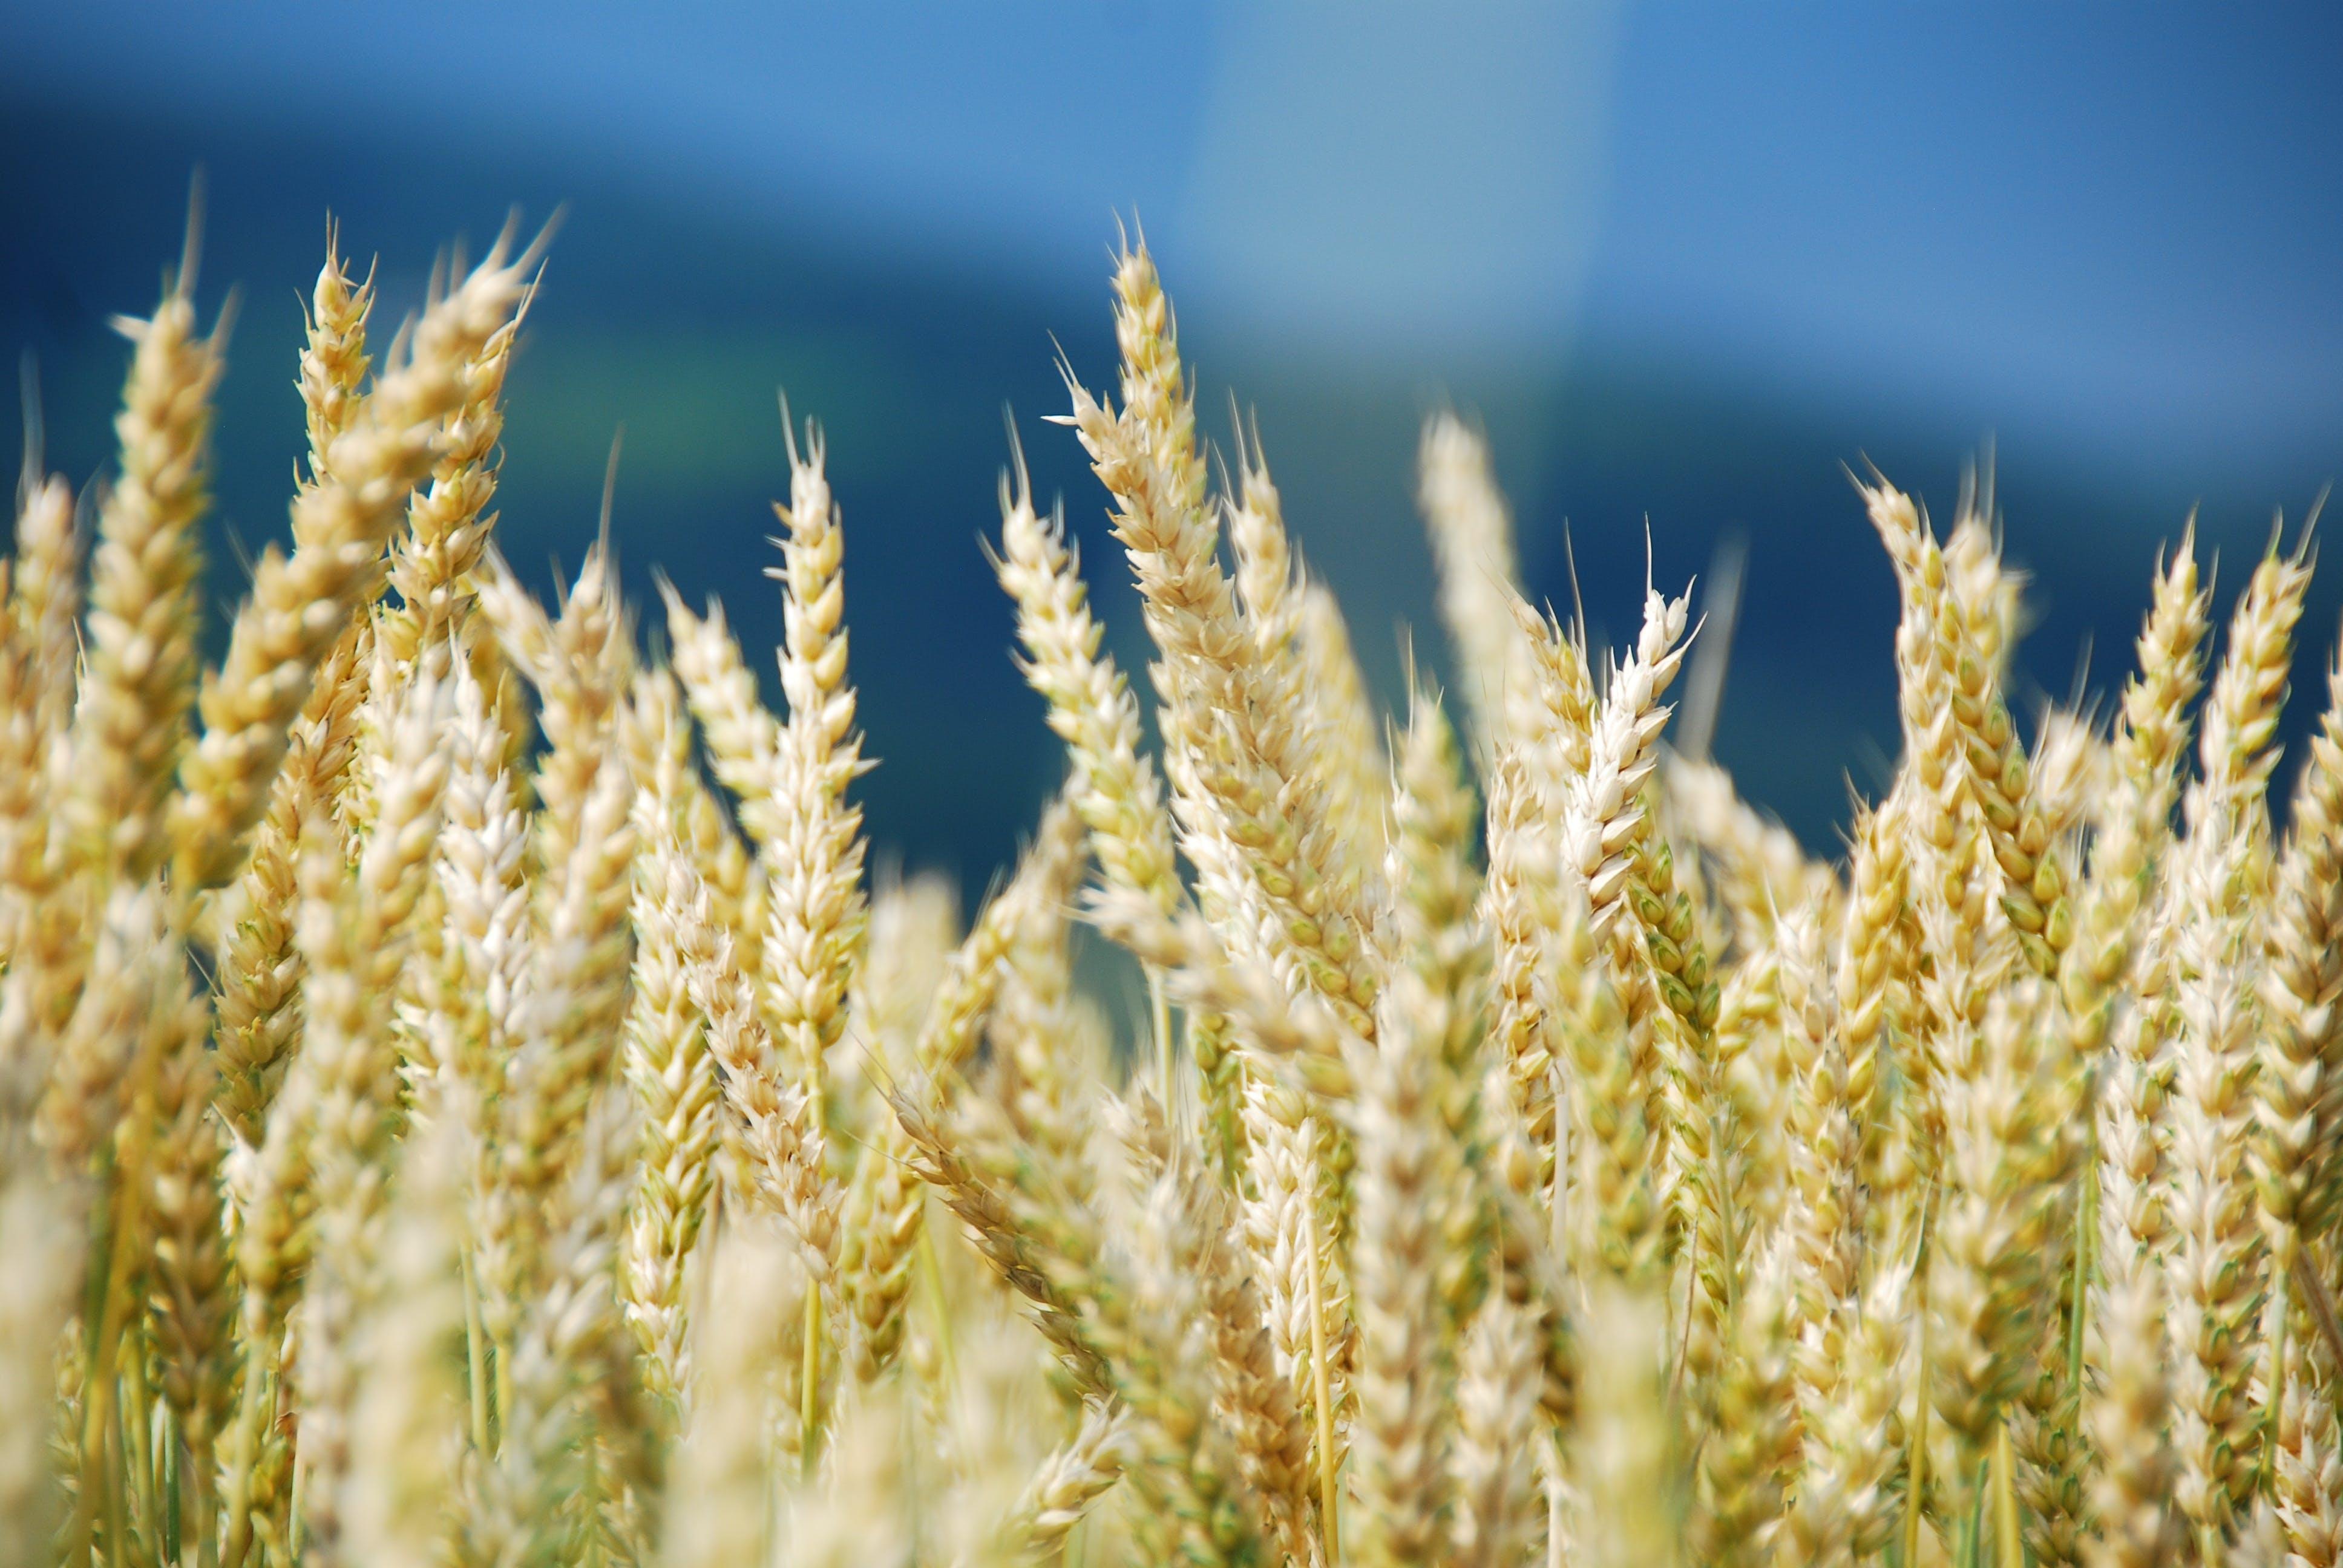 Free stock photo of landscape, cereals, lighting, cornfield